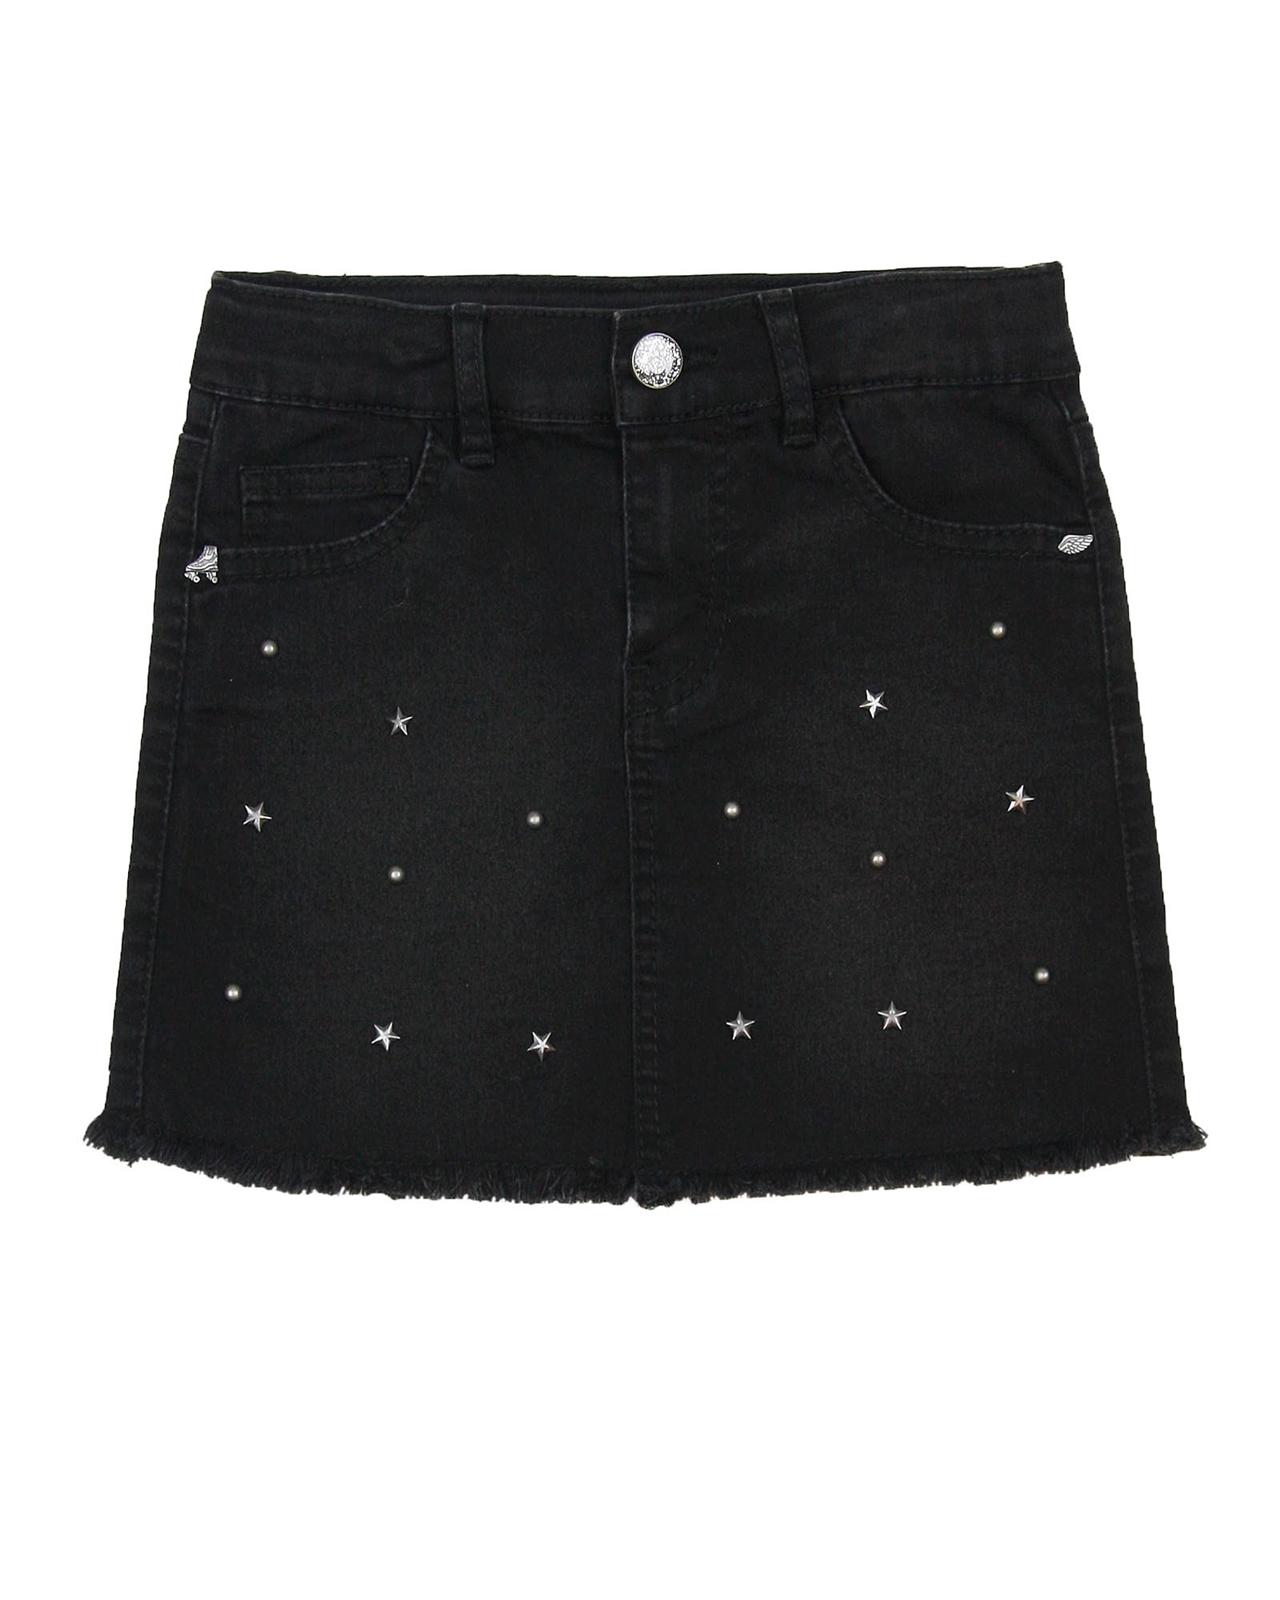 Size 12 2019 Latest Design Next Denim Skirt Clothing, Shoes & Accessories Women's Clothing